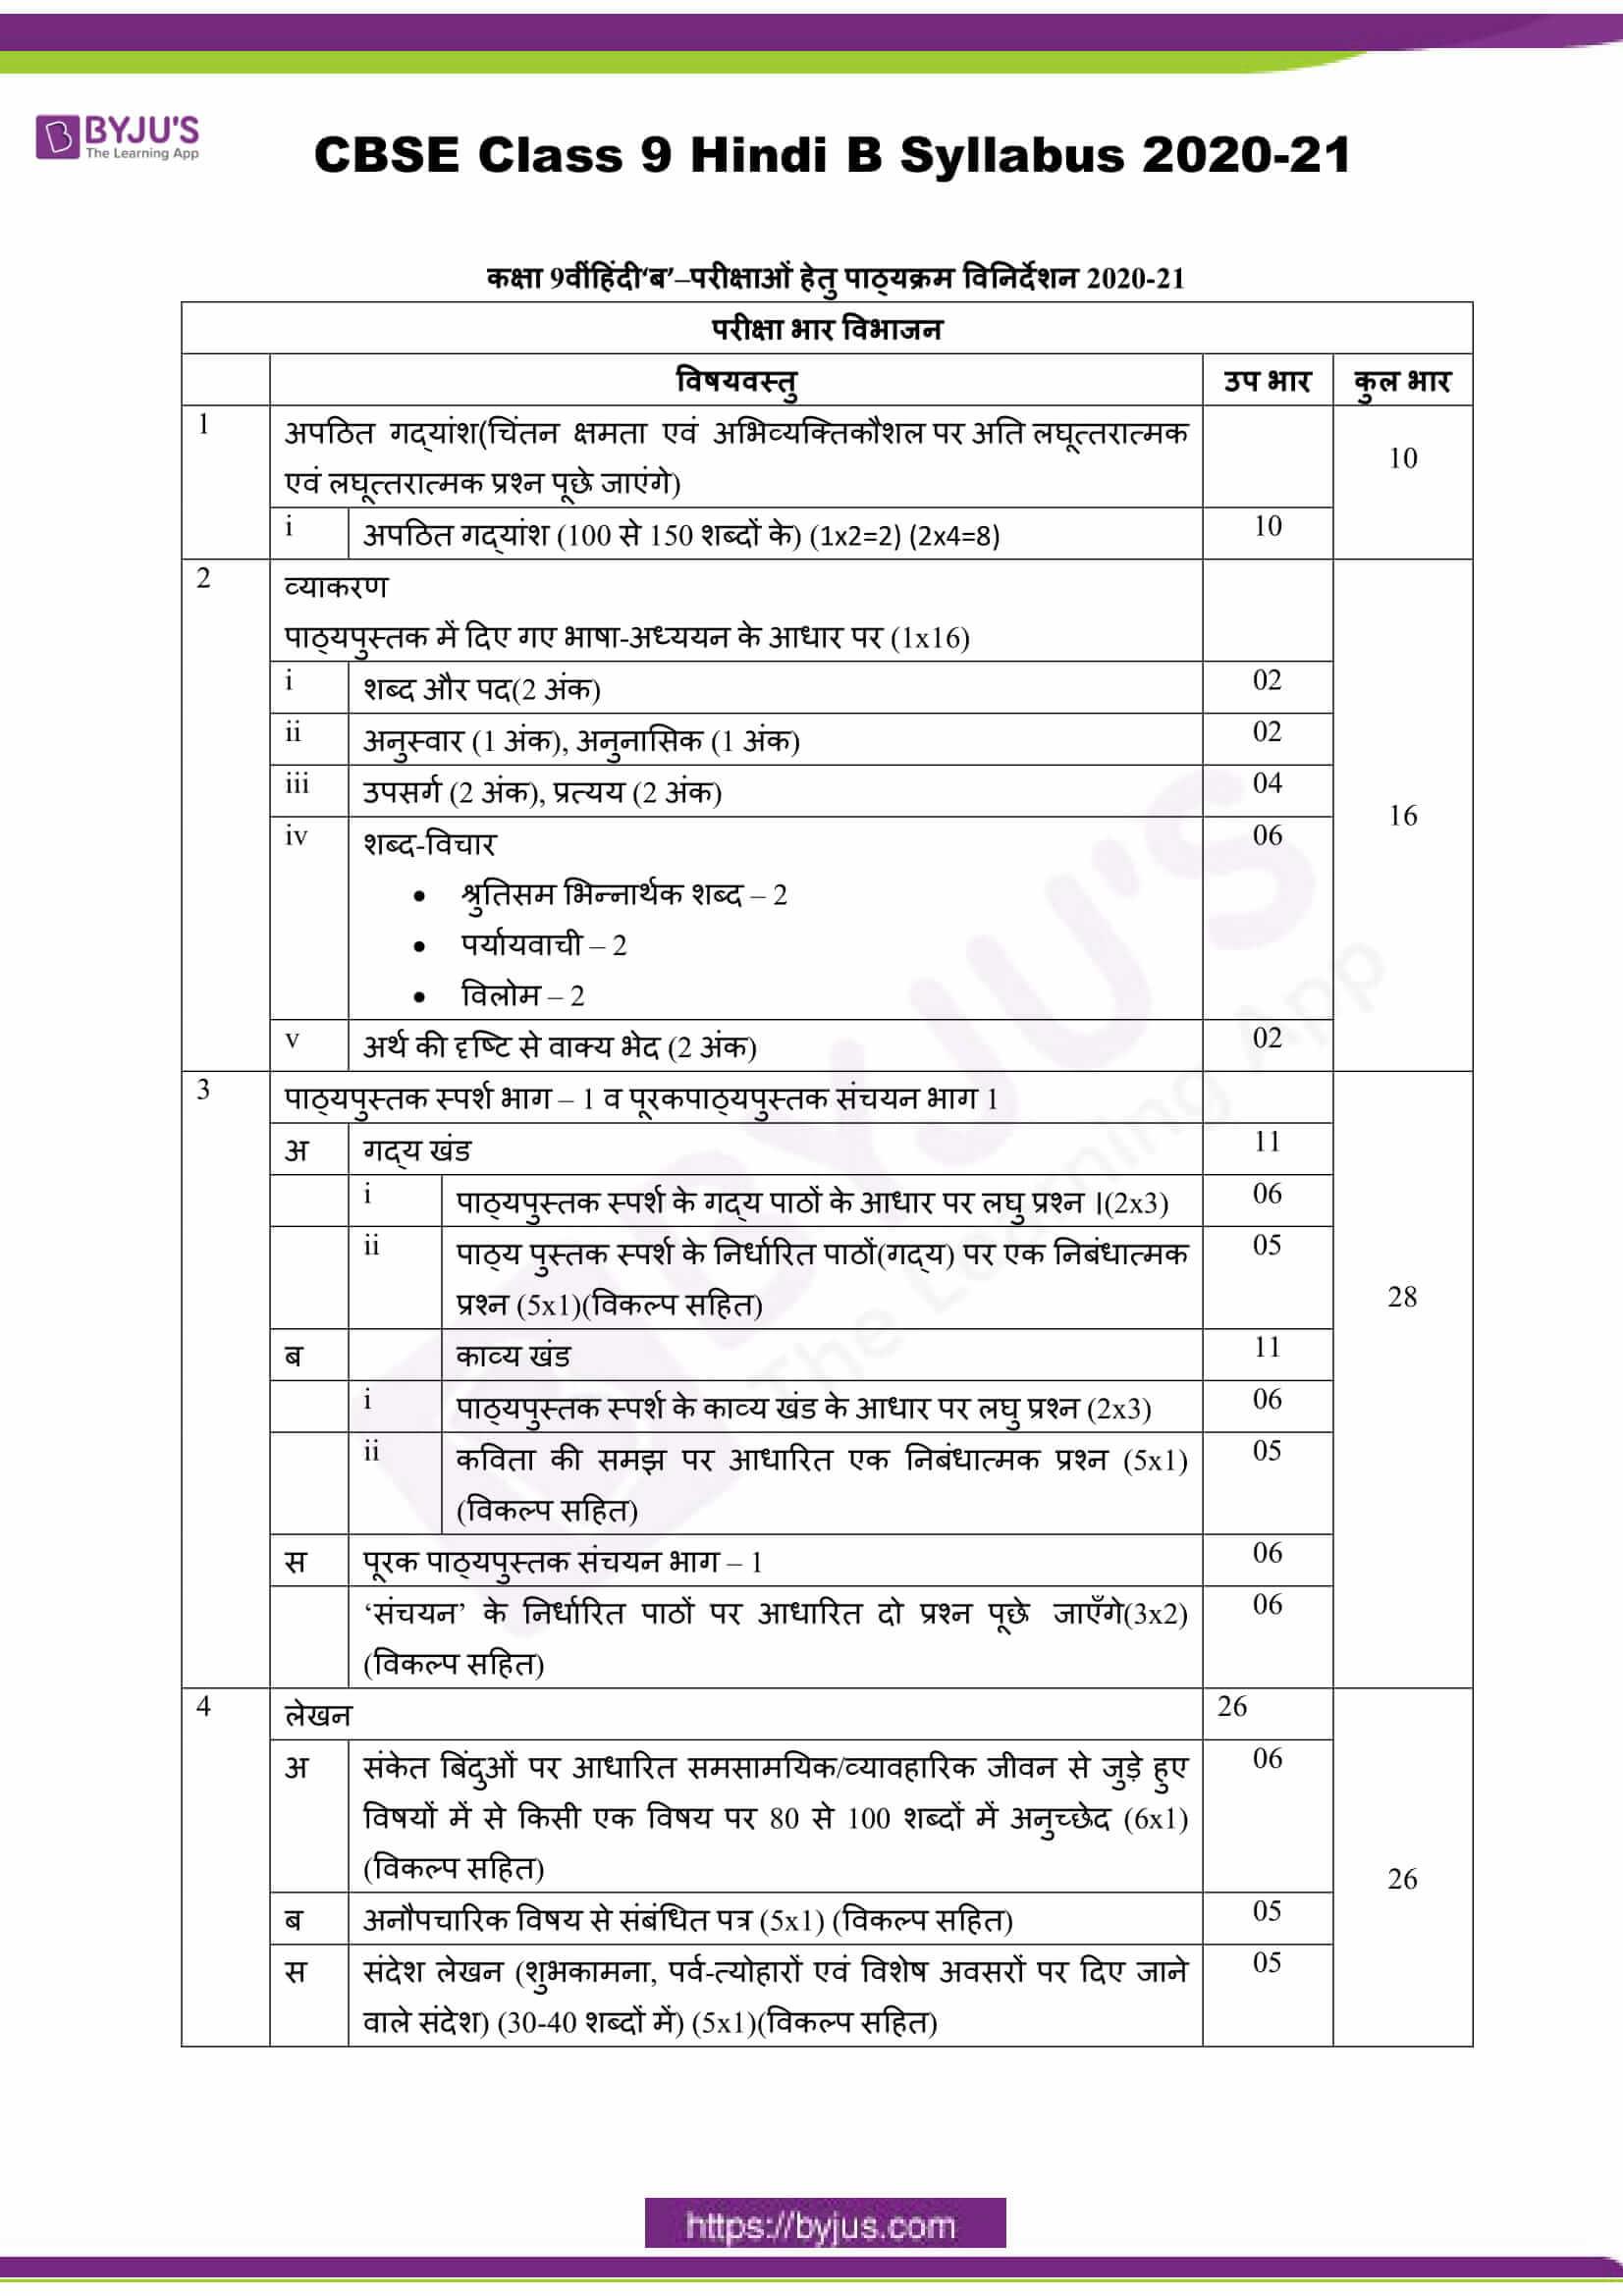 cbse class 9 hindi b sylbus 2020 21 1